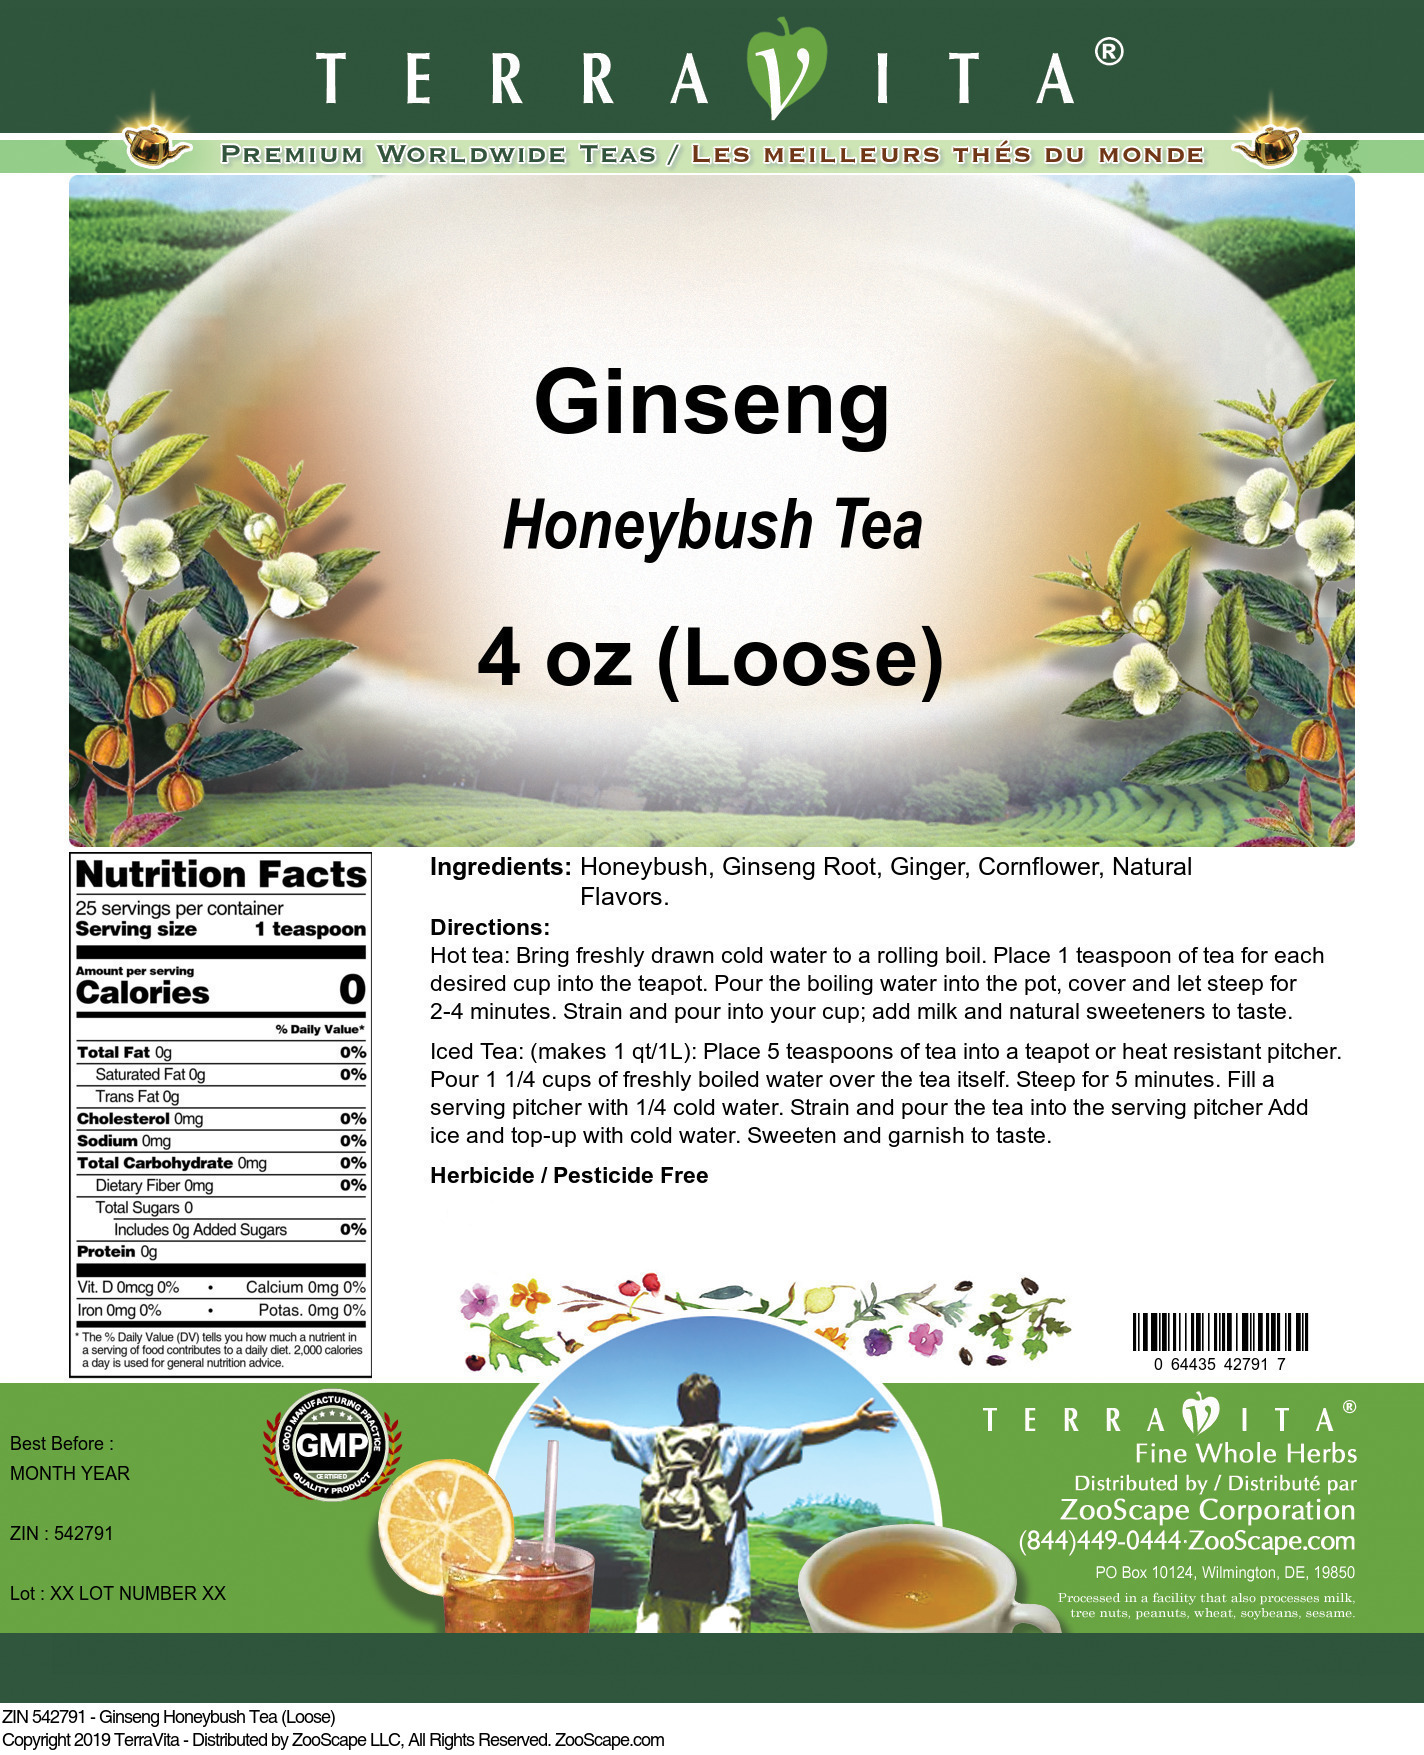 Ginseng Honeybush Tea (Loose)